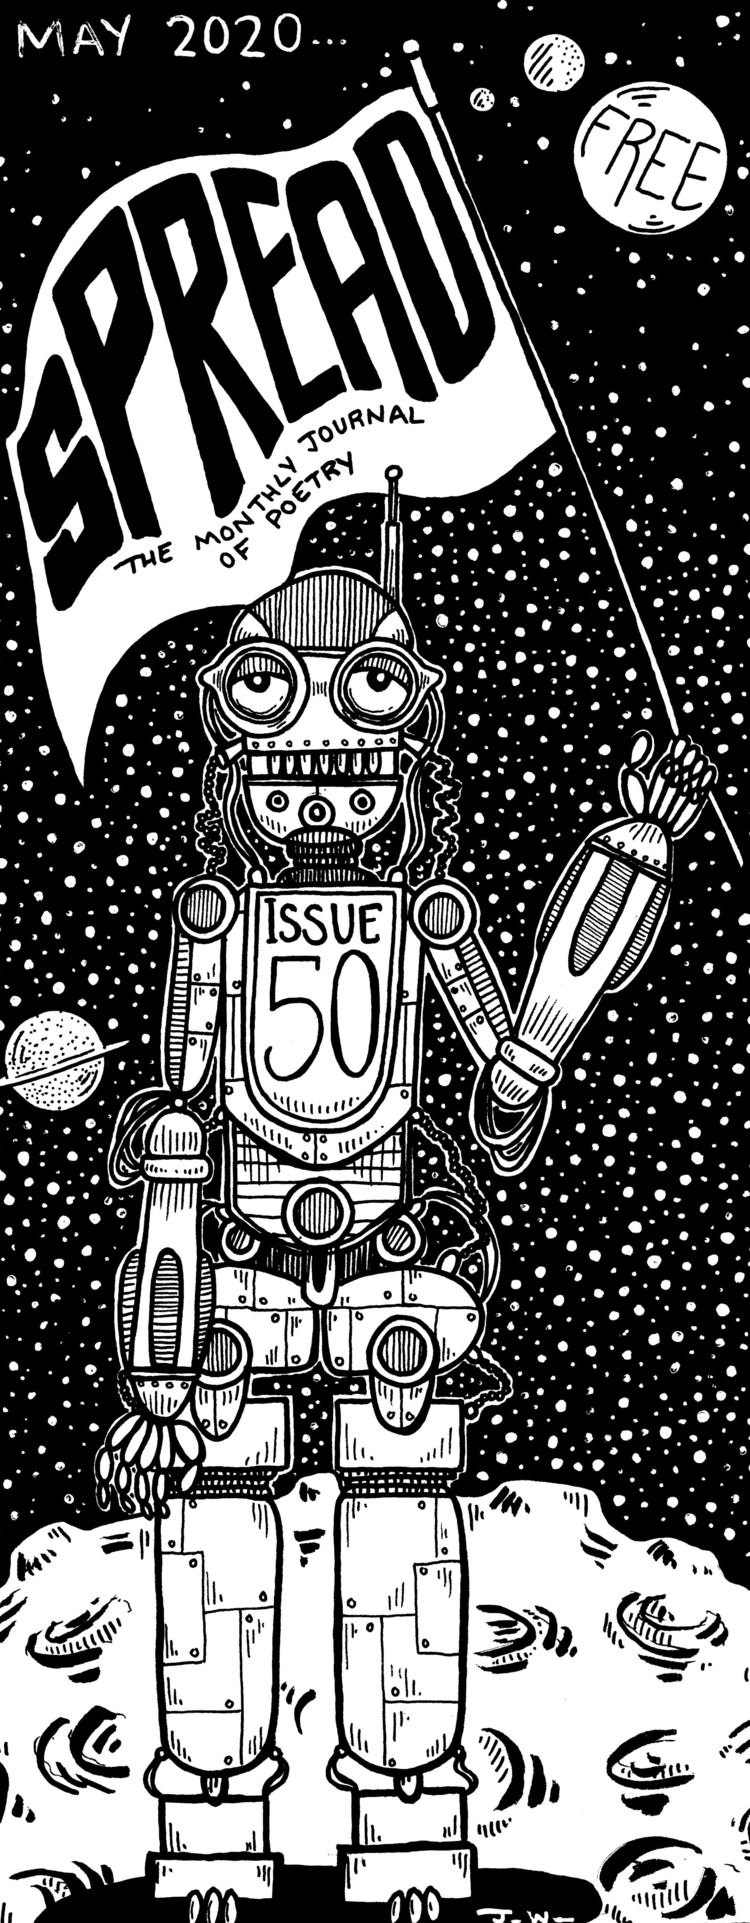 break covid comics draw cover 5 - juliawald | ello